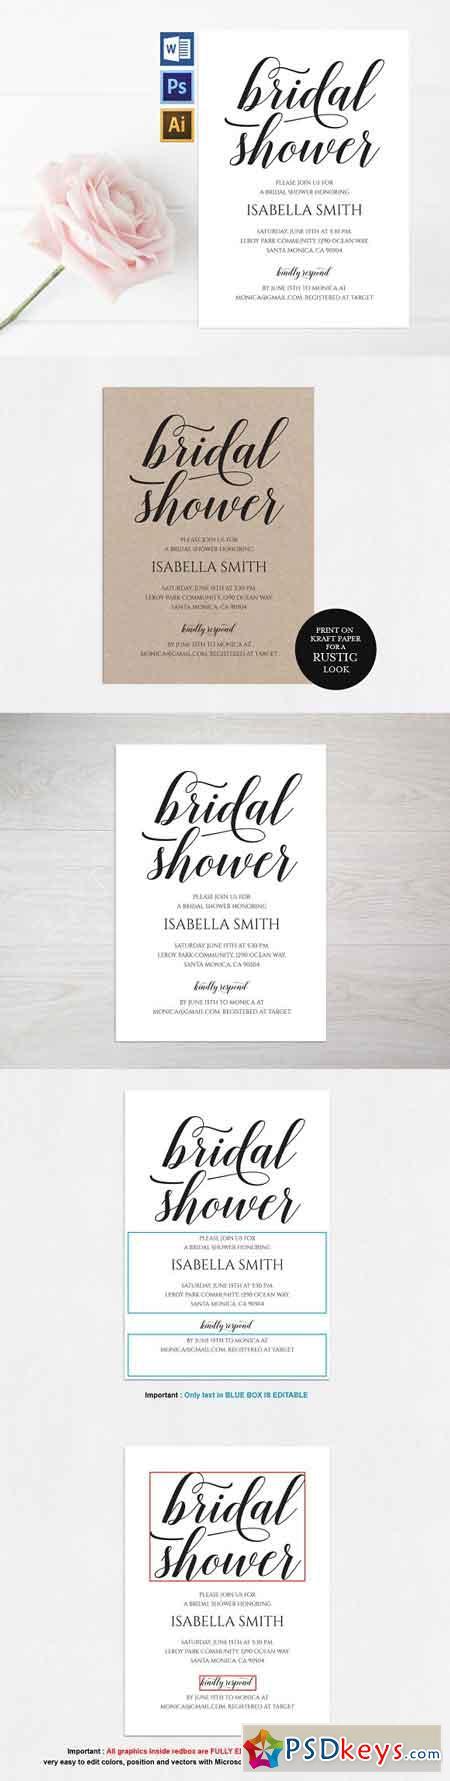 Bridal Shower Invitation Wpc309 1765233